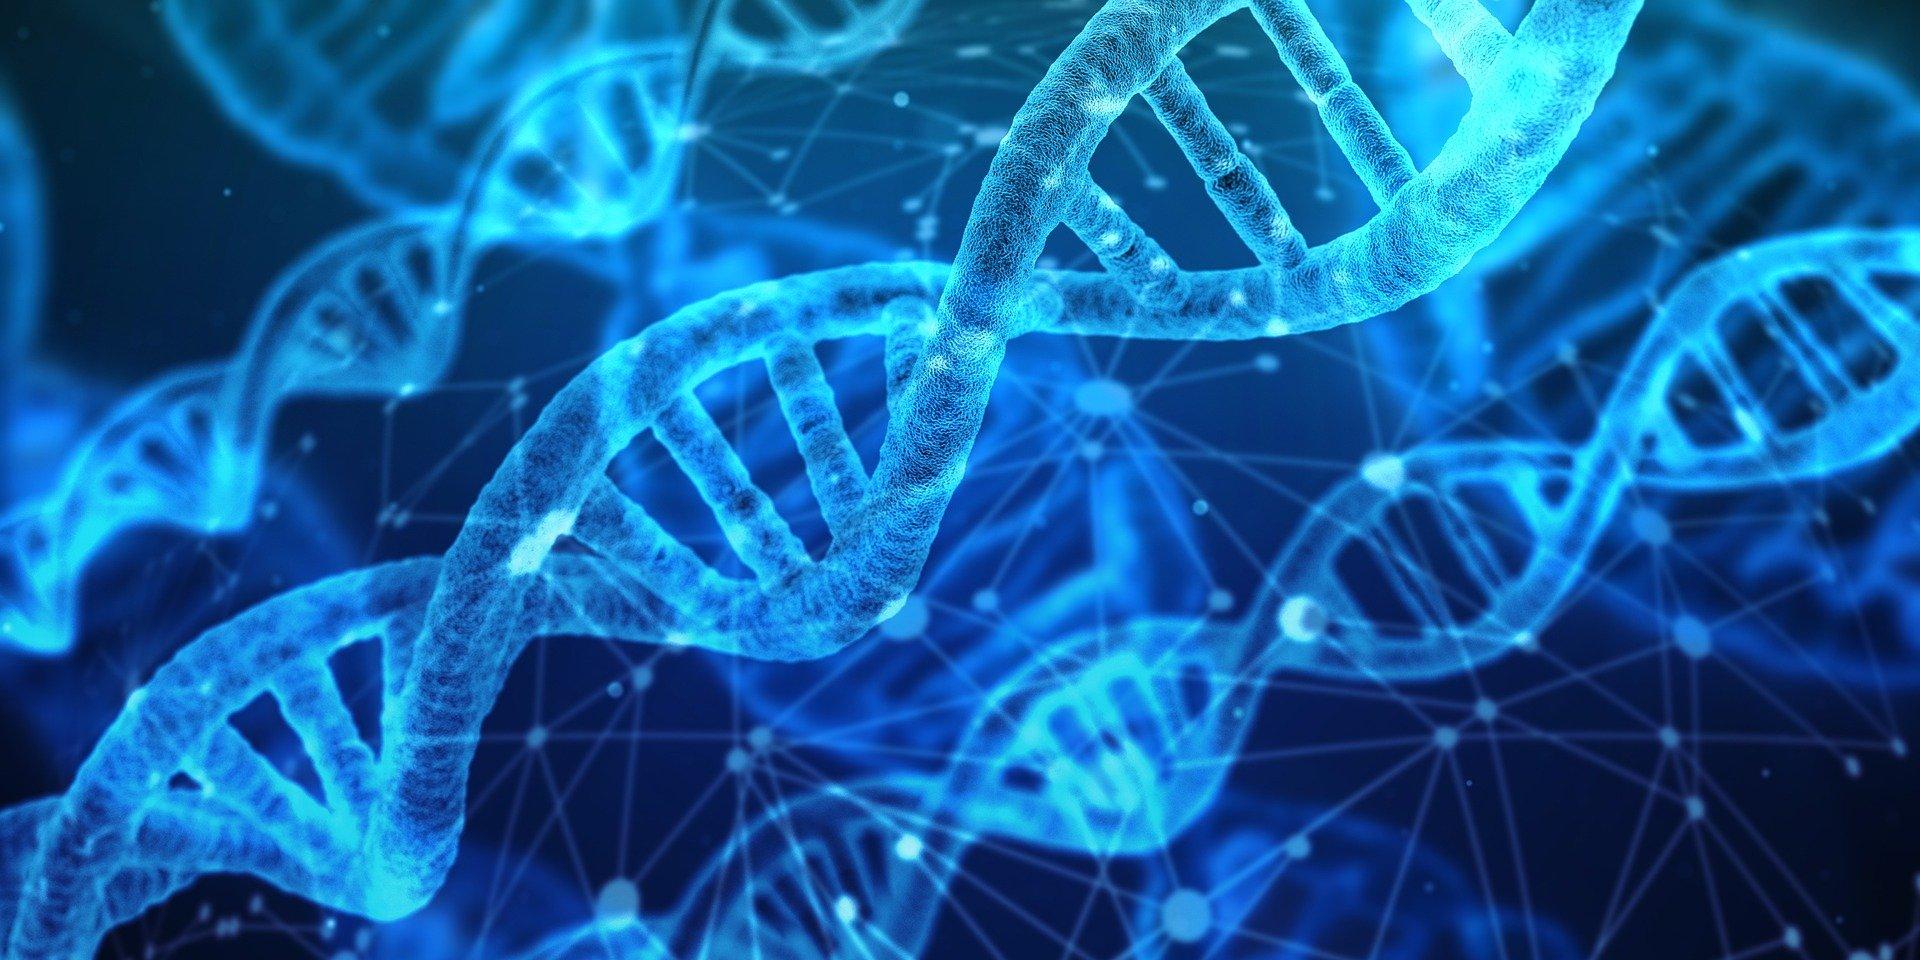 ¿Genética o aprendizaje?